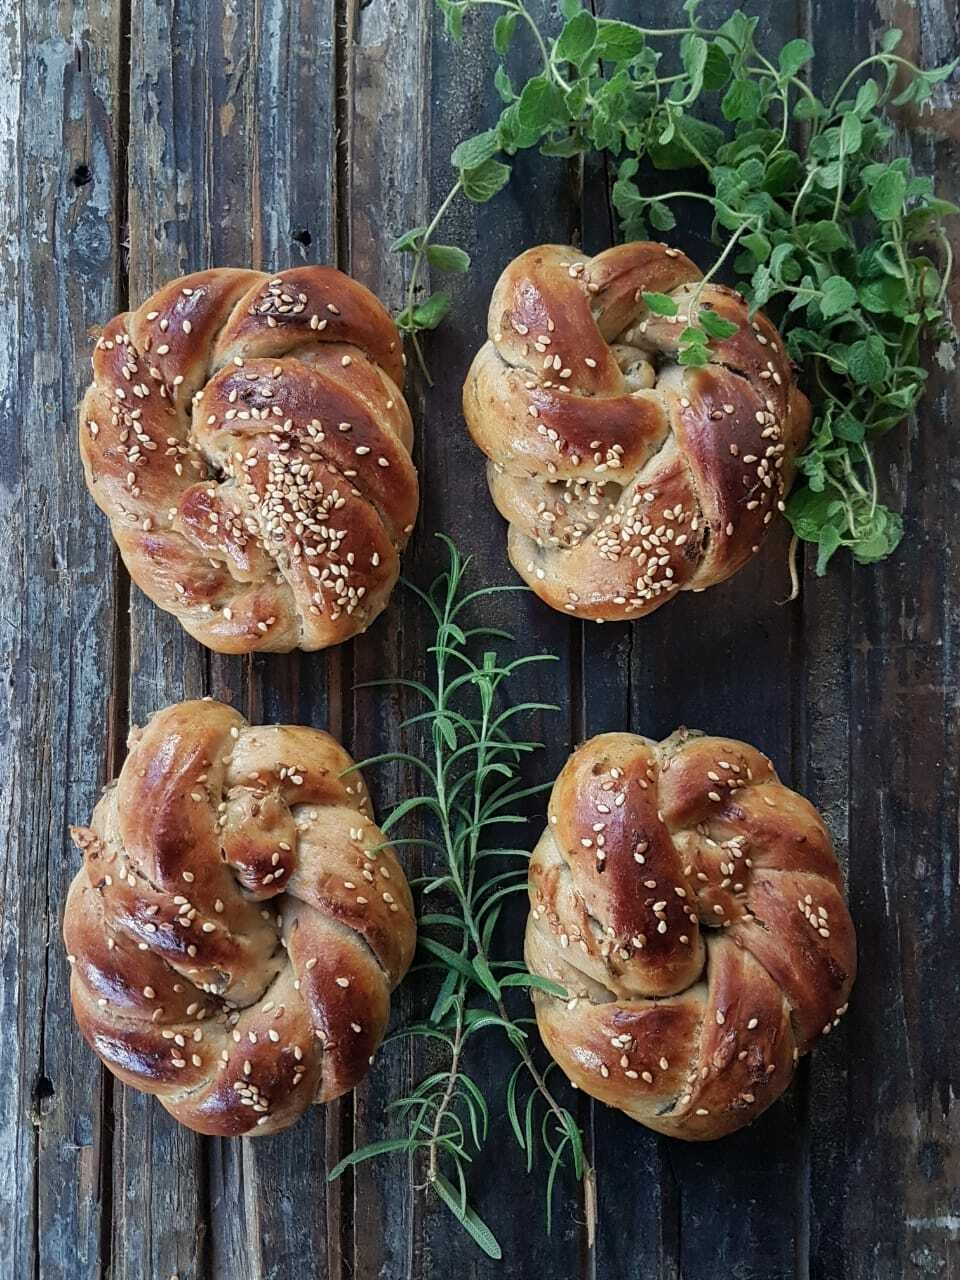 Bun Wild Thyme and Rosemary كعكة وايلد زعتر وإكليل الجبل (Pack of 6) - Crafting Delices